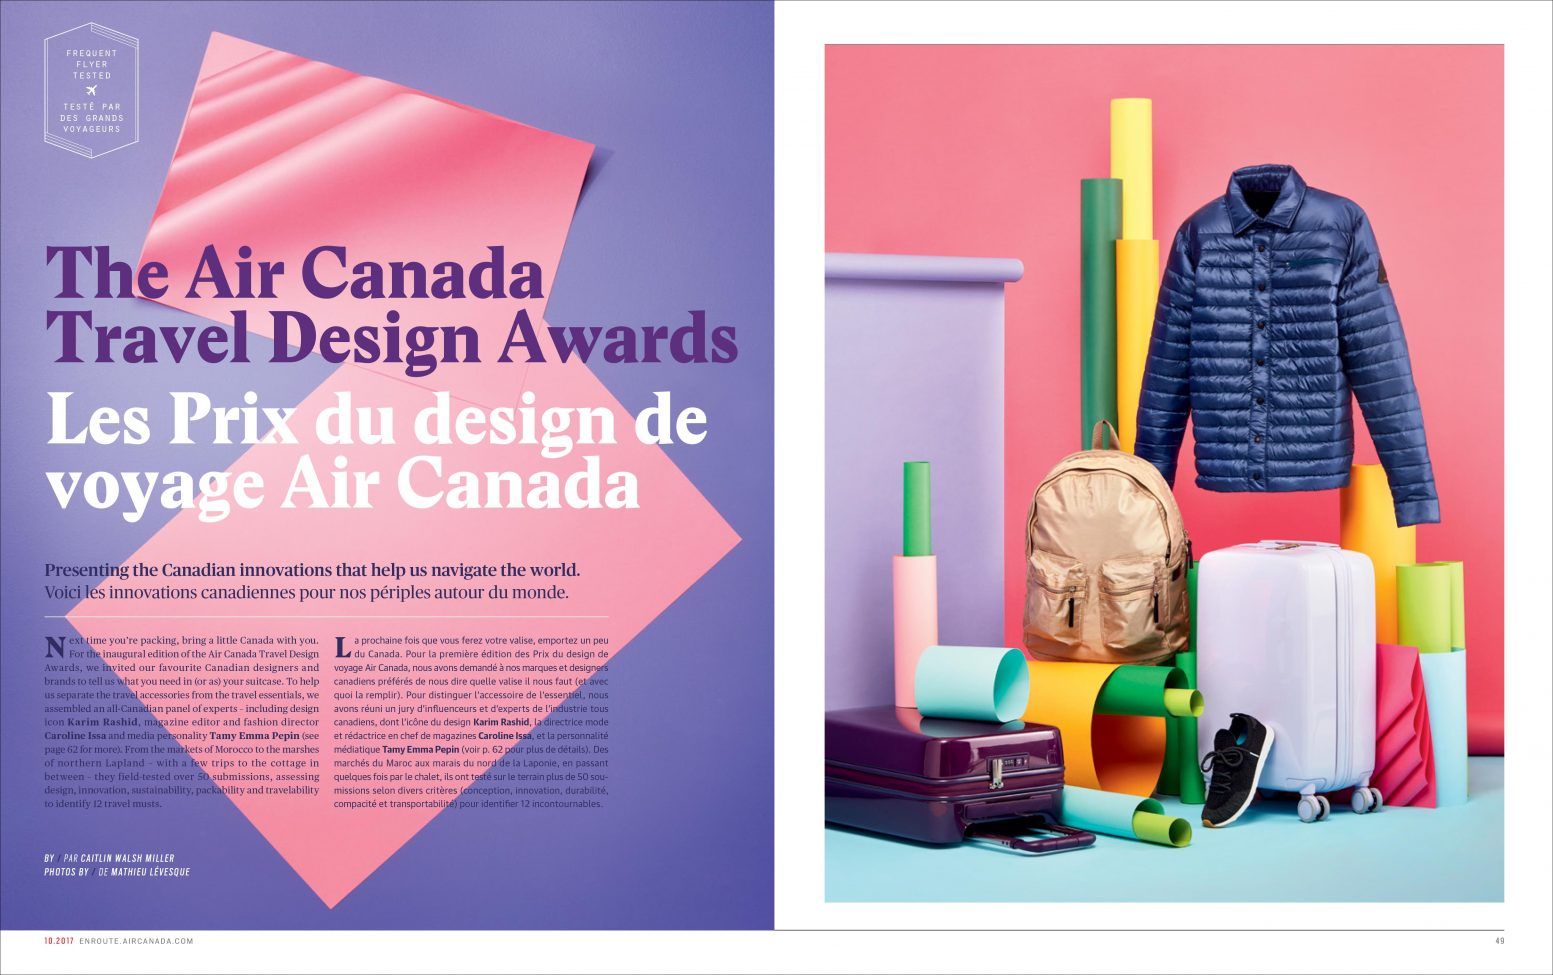 the air canada travel design awards enroute magazine september 2018